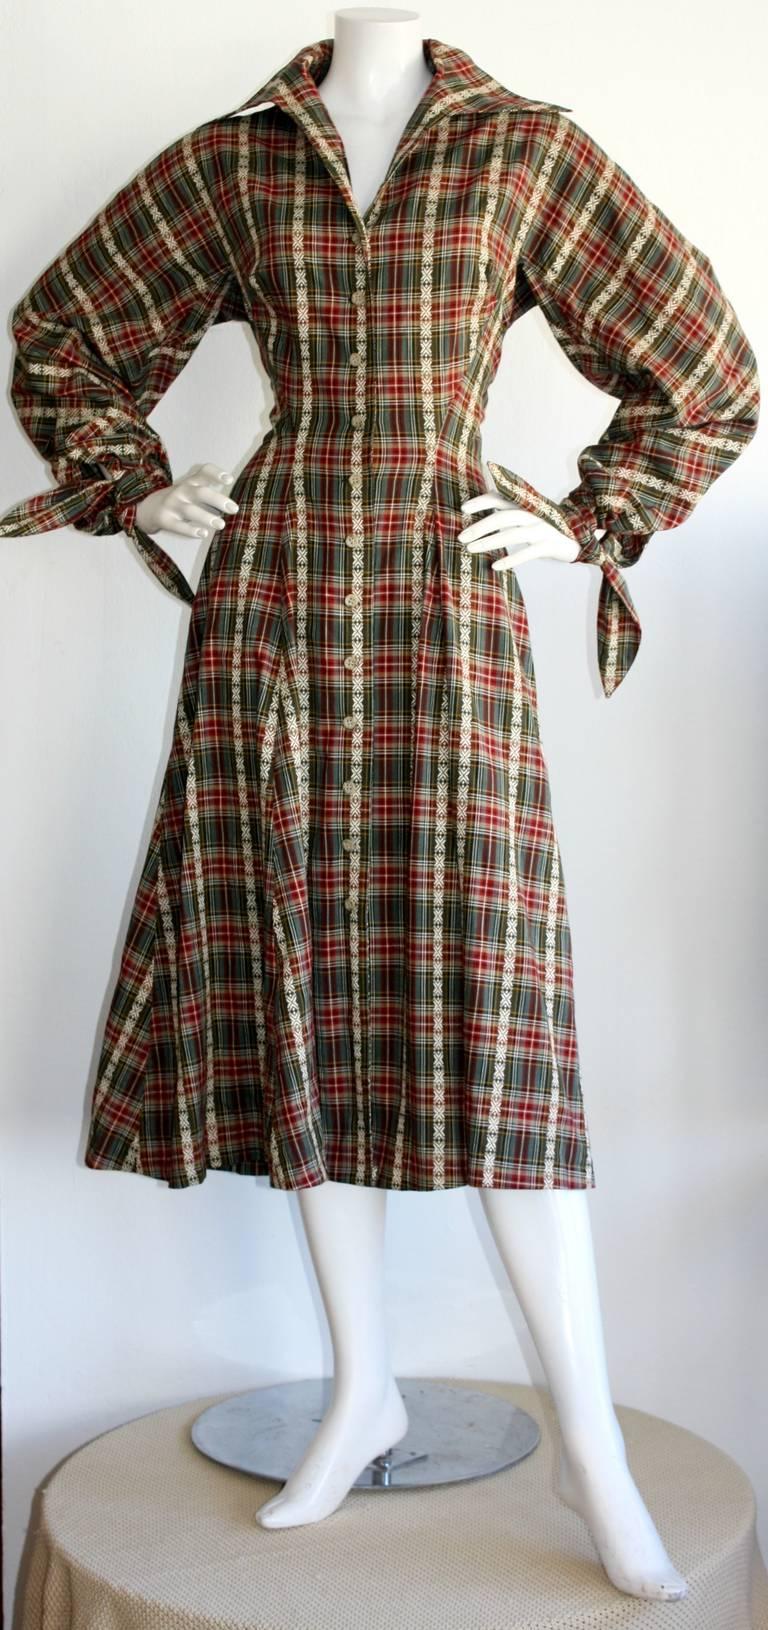 Vintage Byron Lars Tartan Plaid Tie Bow Shirt Dress 2